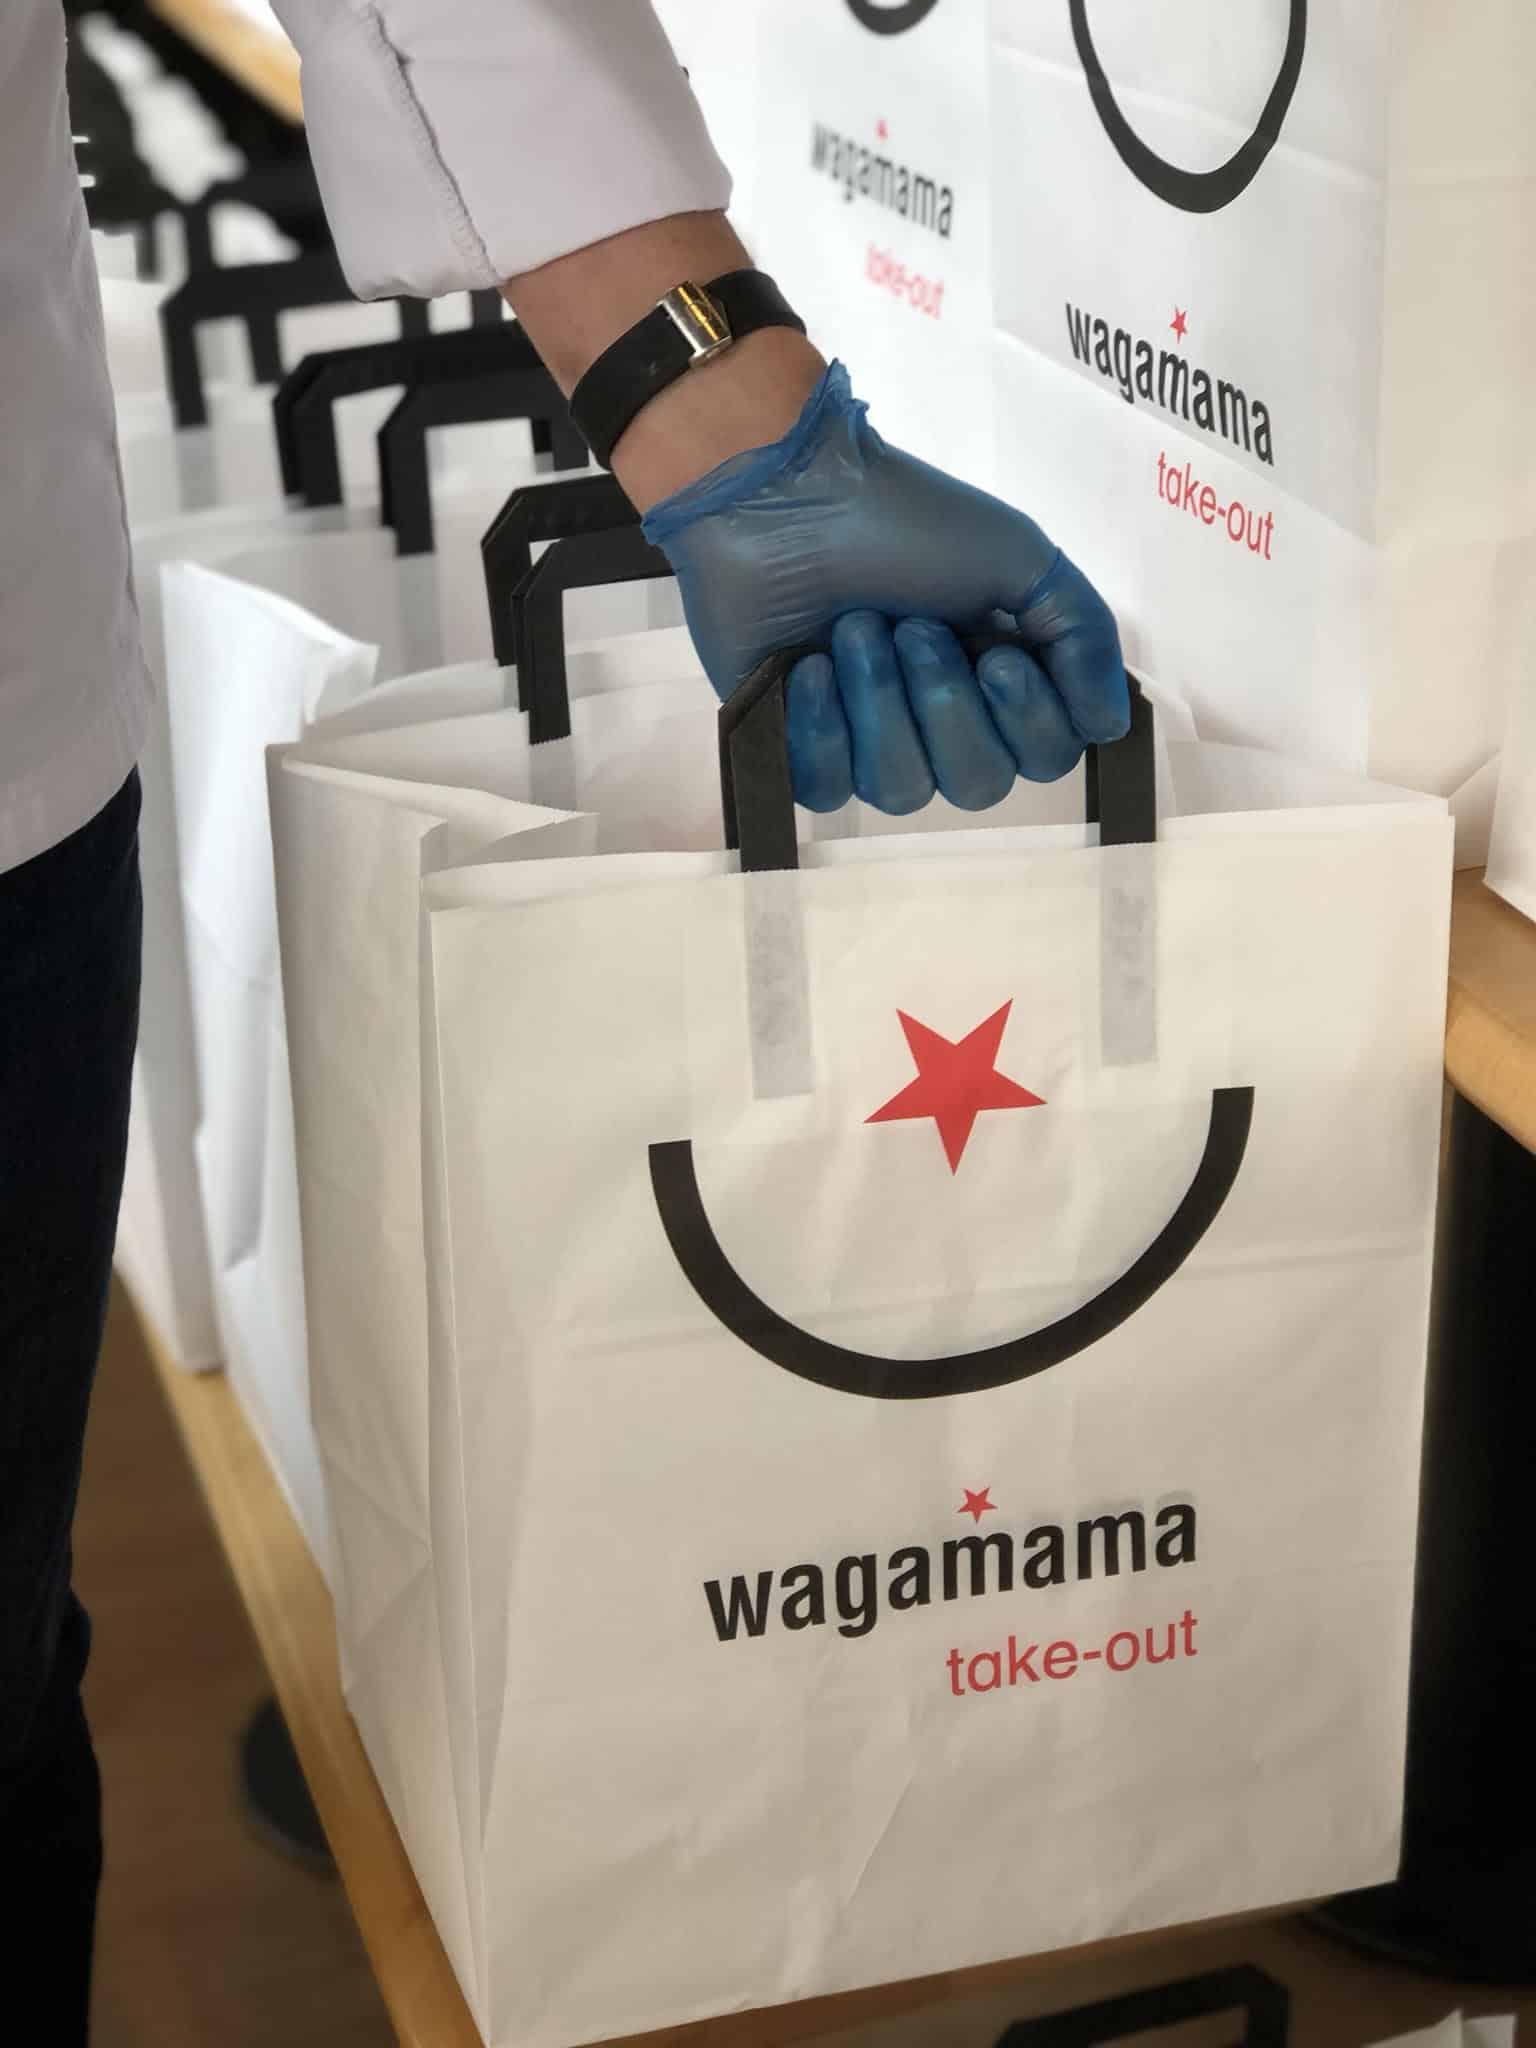 Wagamama take-away